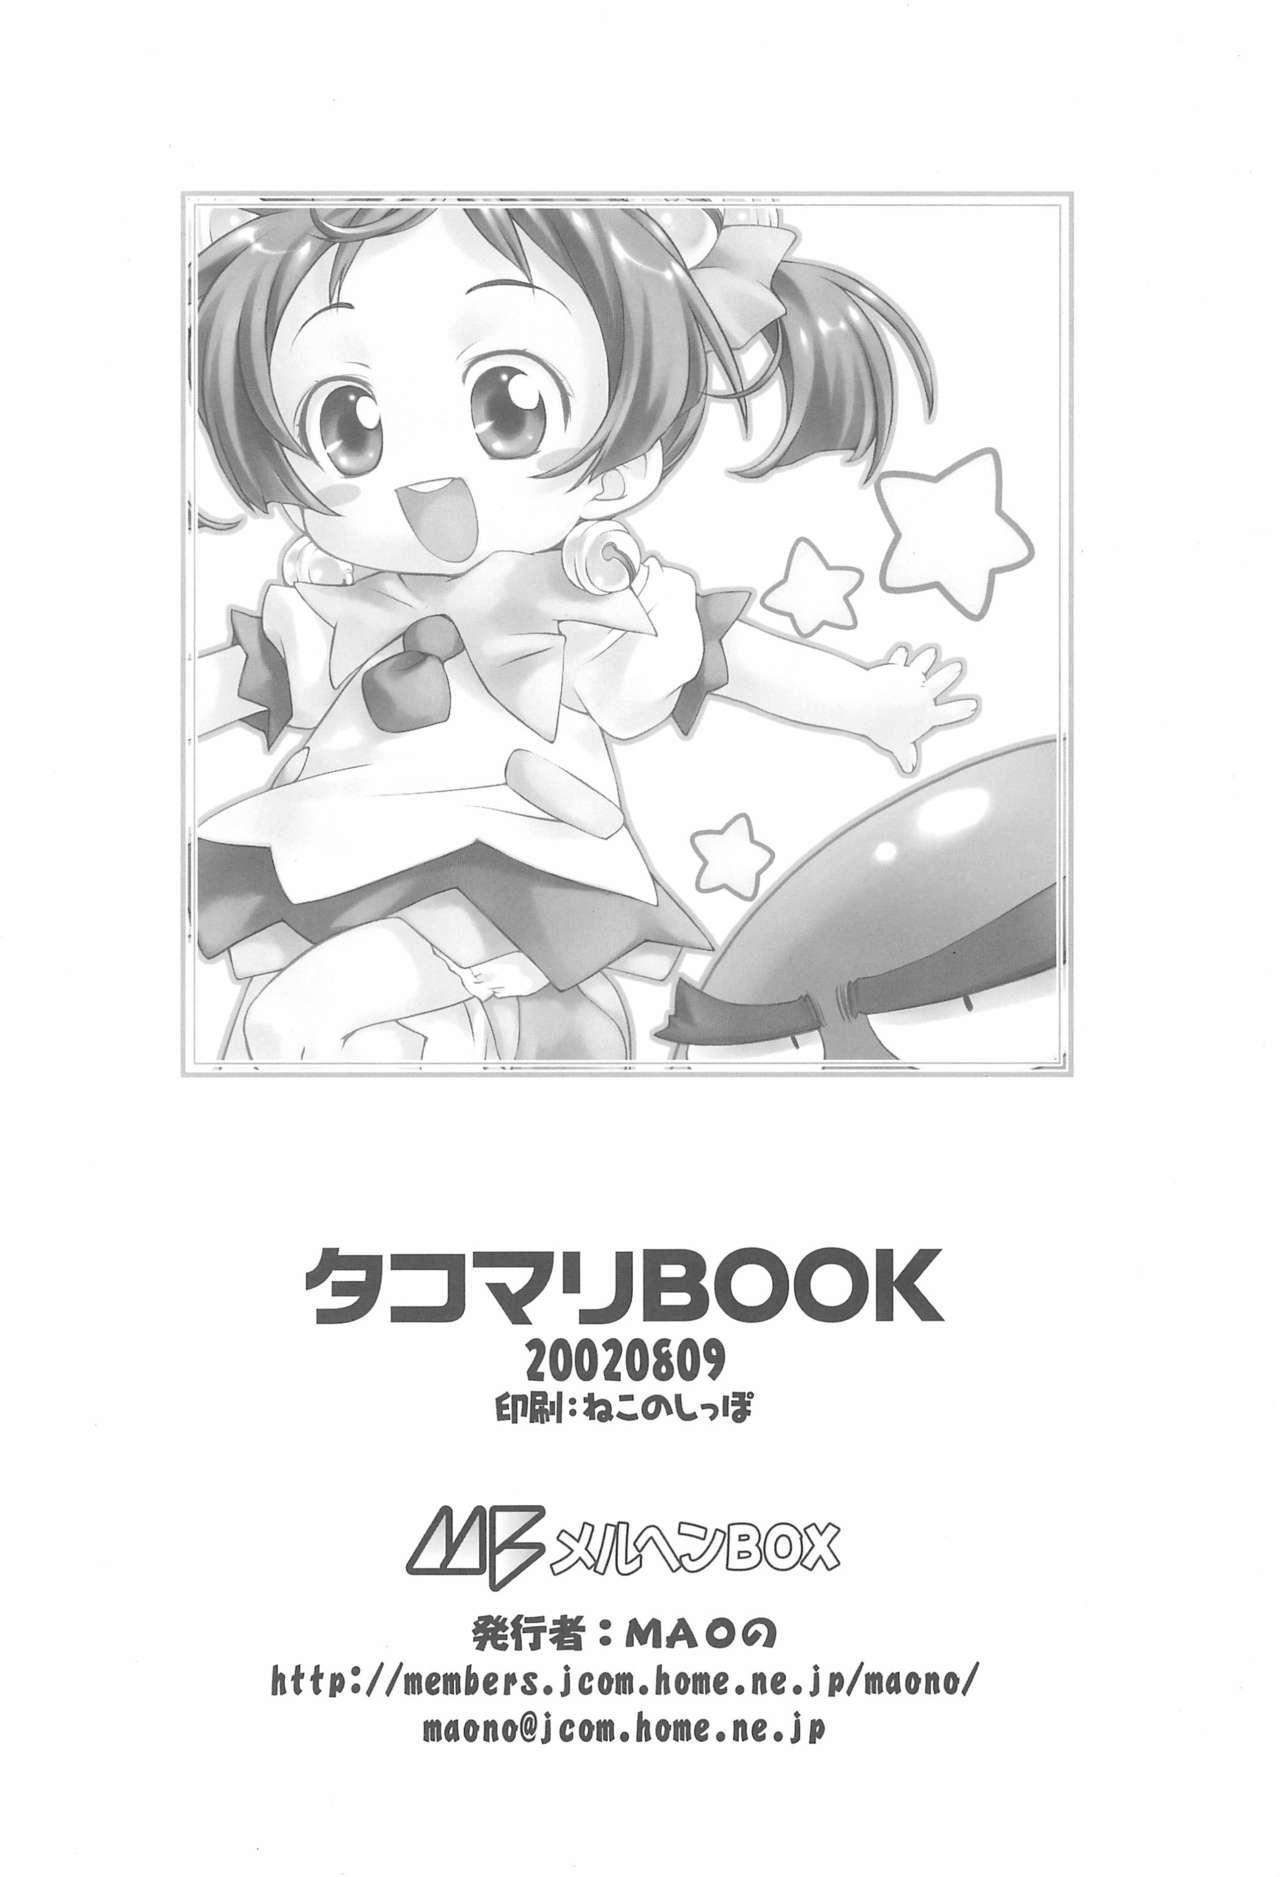 TakoMari BOOK 29